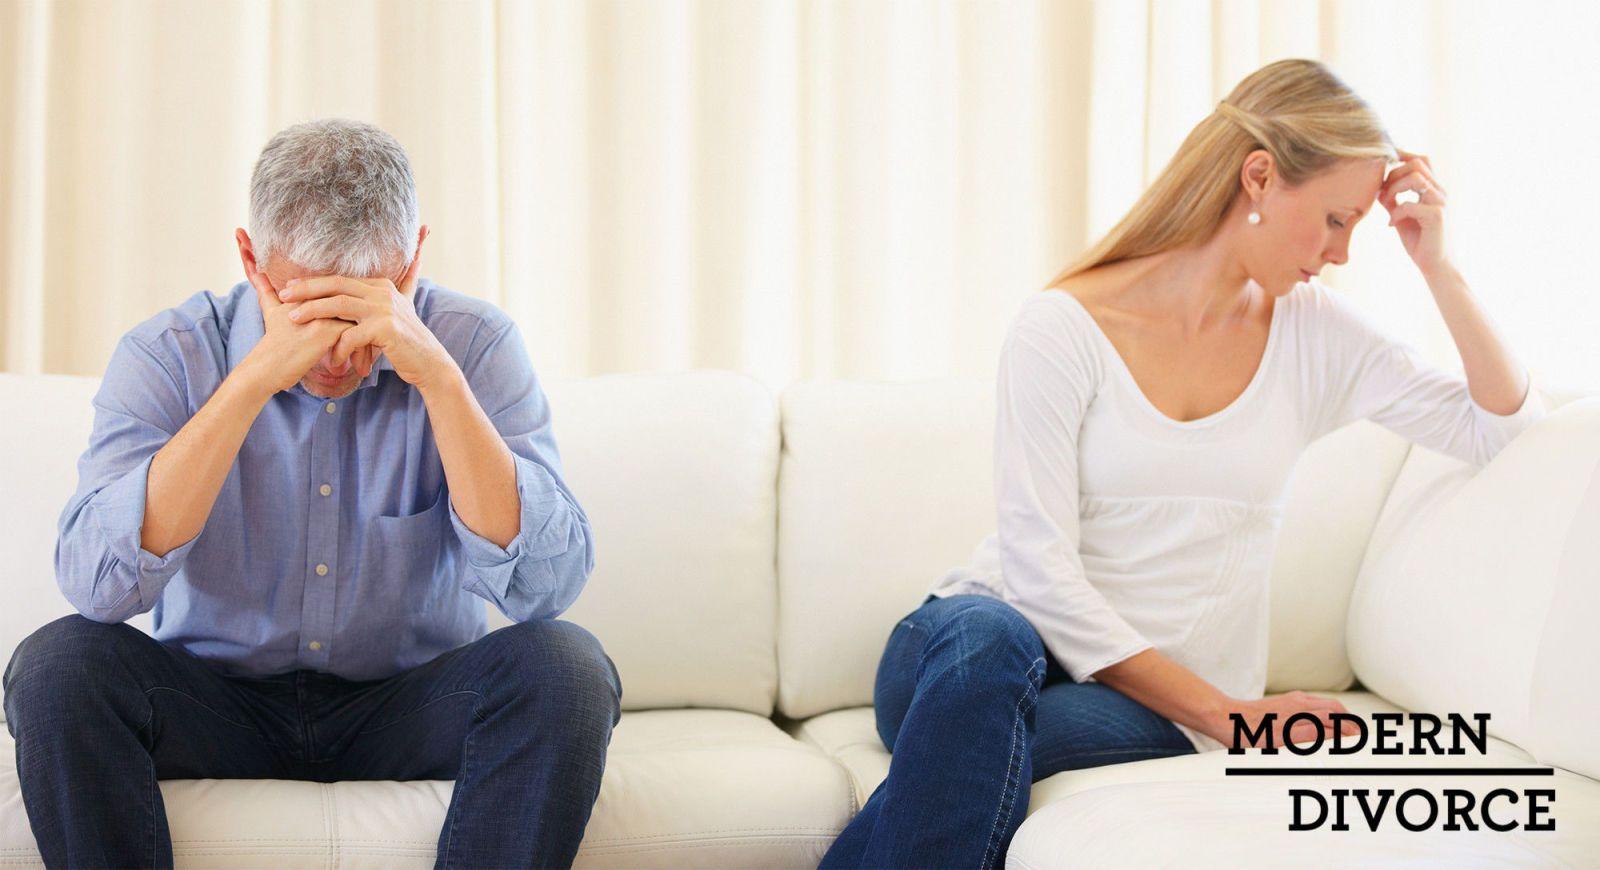 Hookup someone before divorce is final